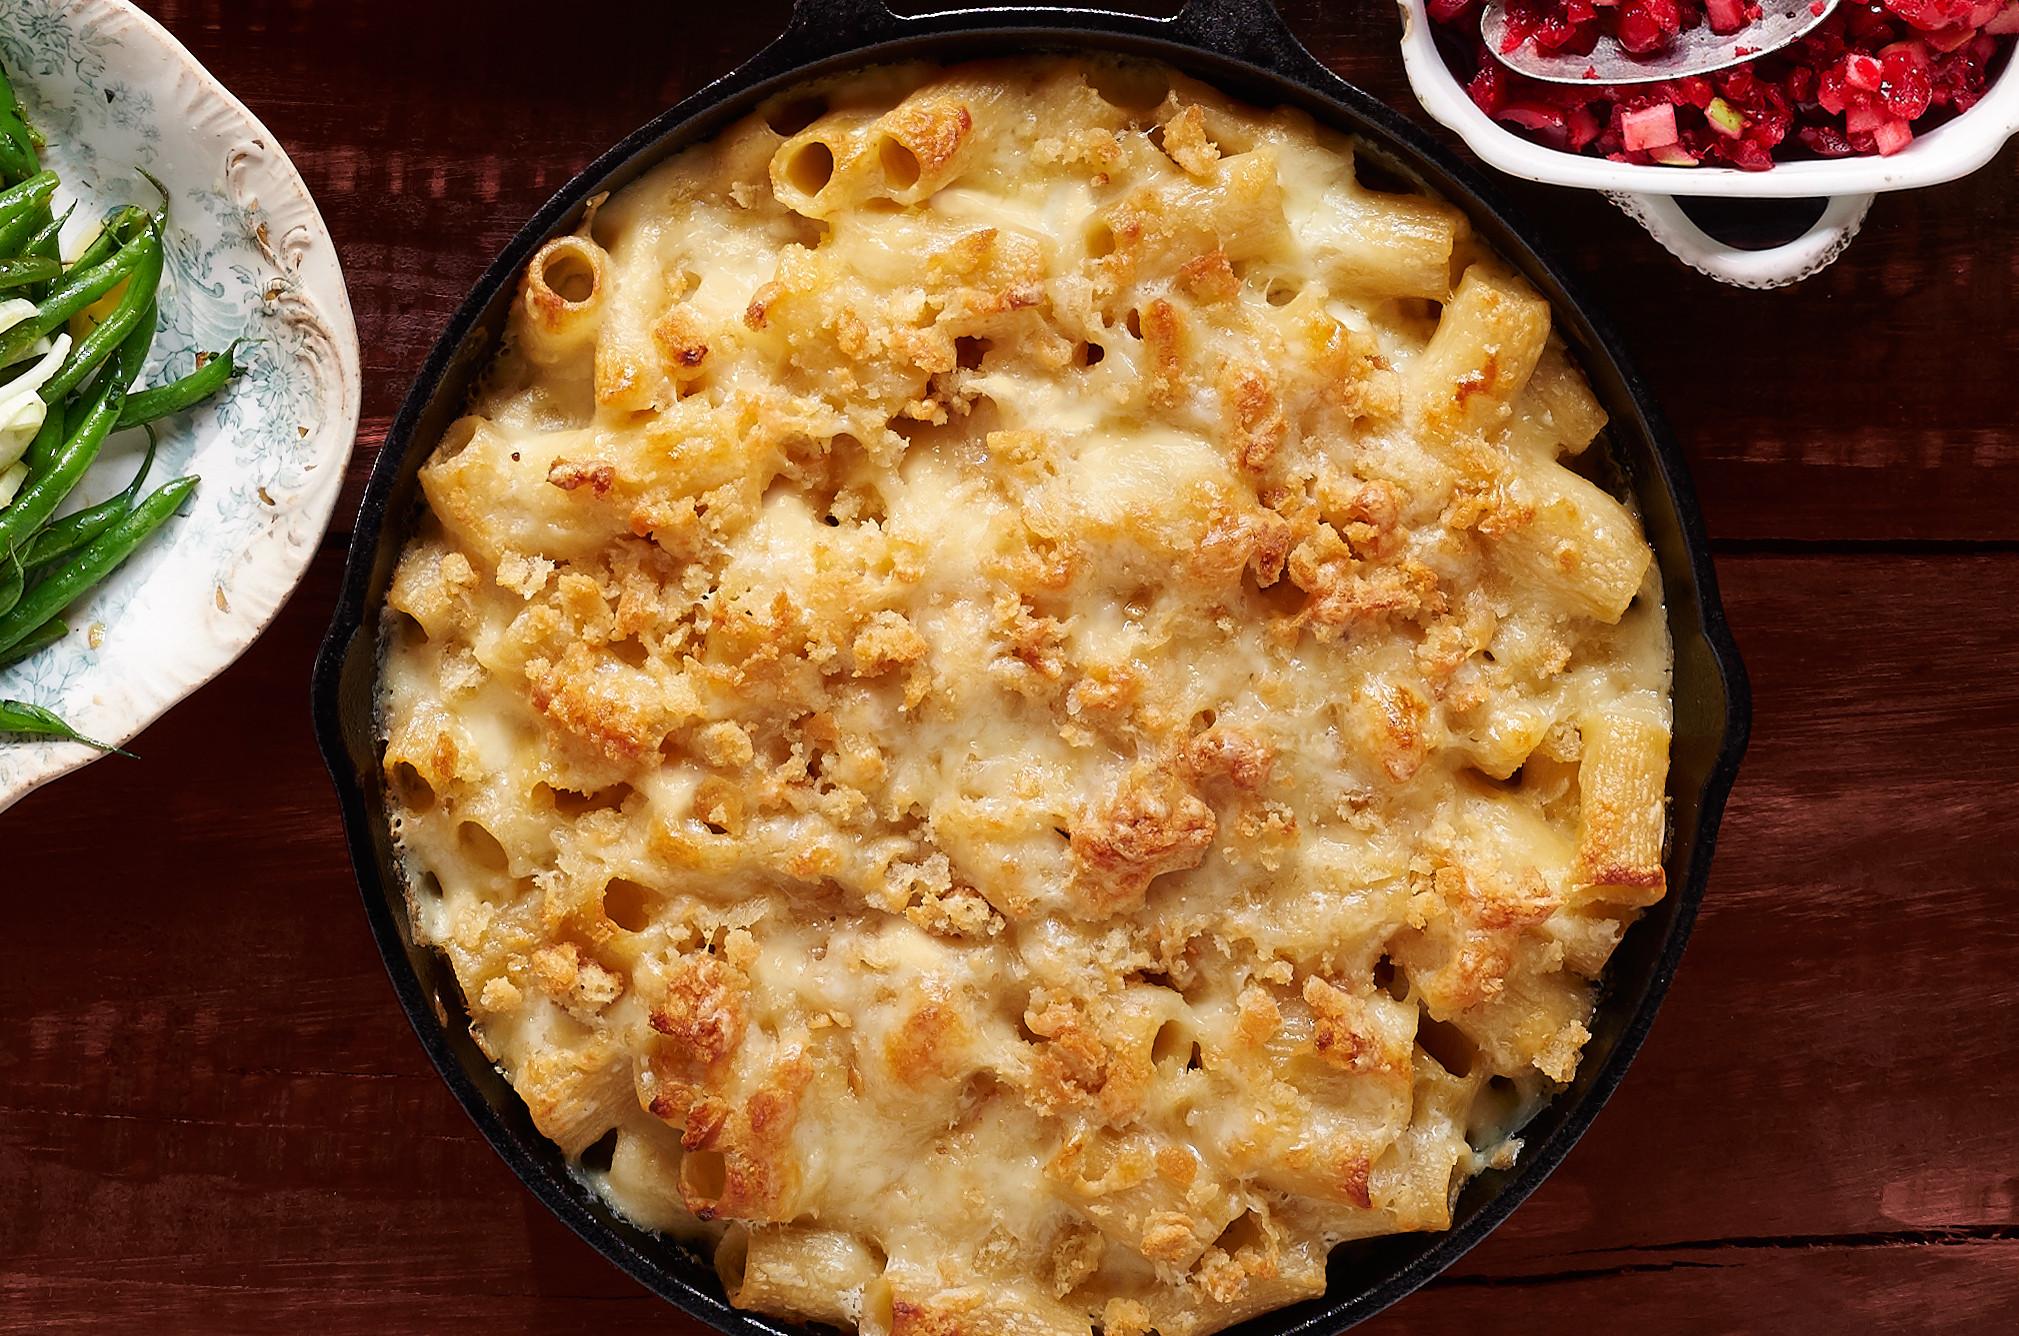 Side Dishes For Thanksgiving Turkey Dinner  100 Easy Thanksgiving Side Dishes Best Recipes for